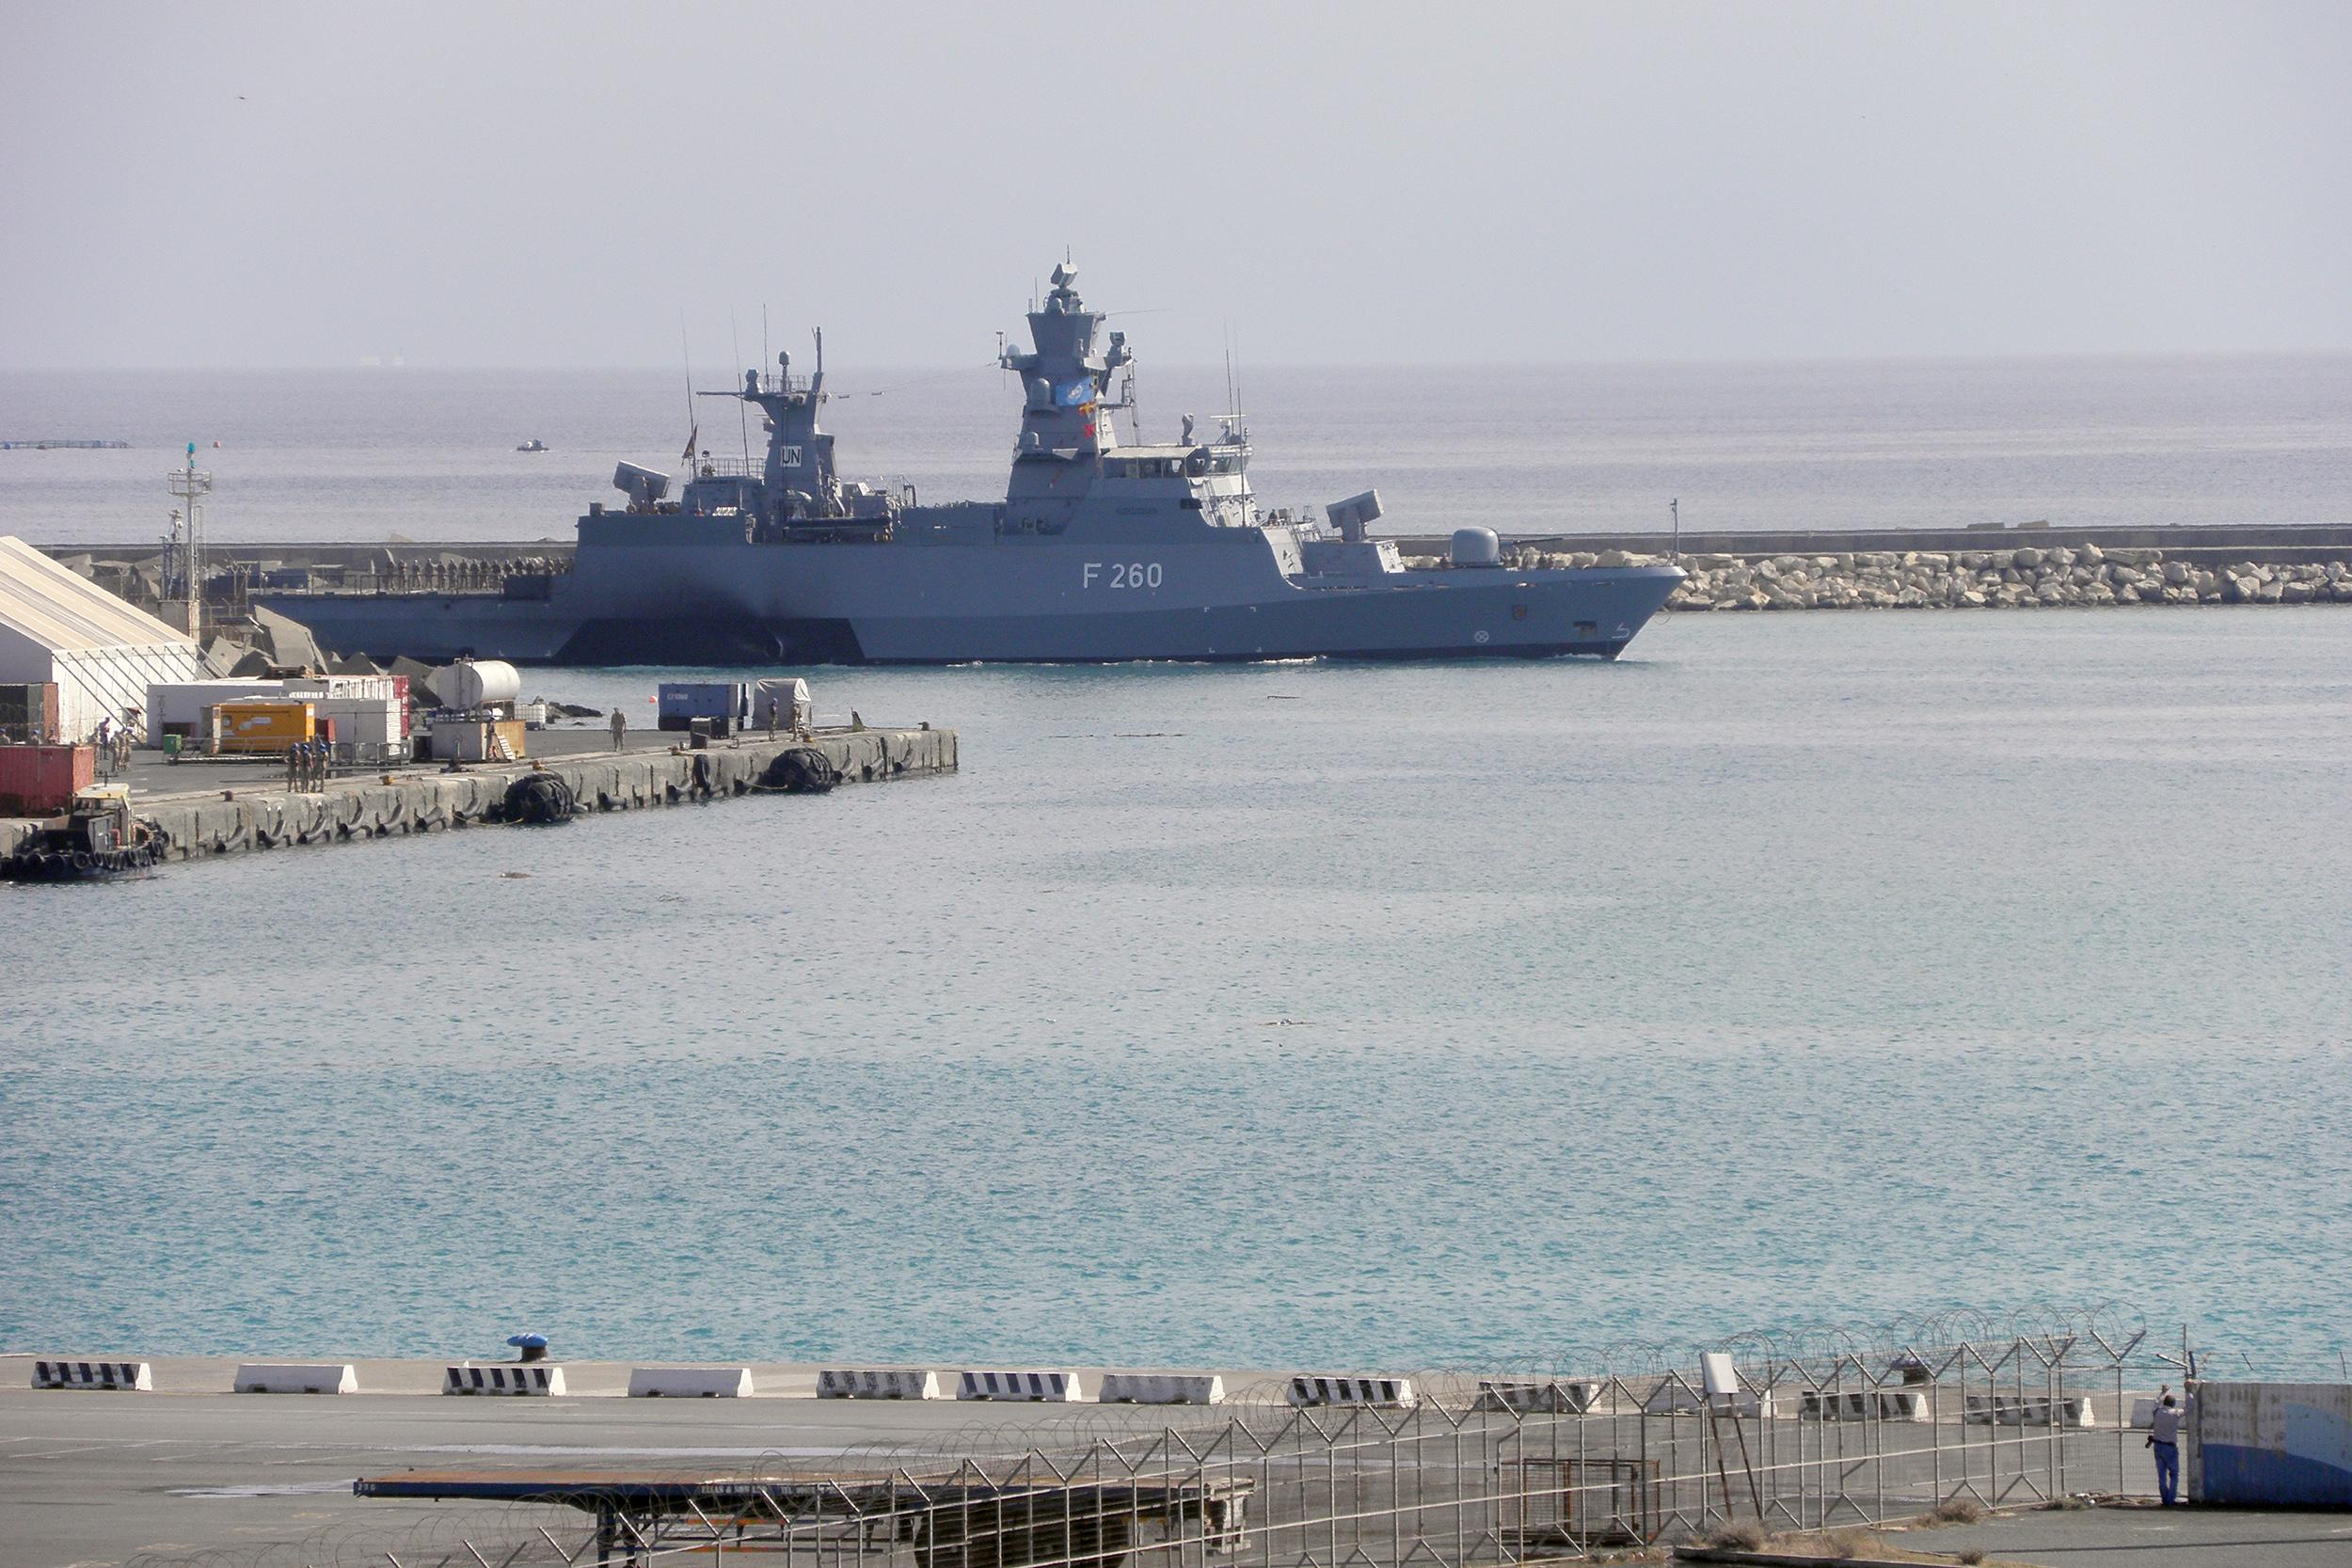 Mysterious plane crash in Cyprus sea